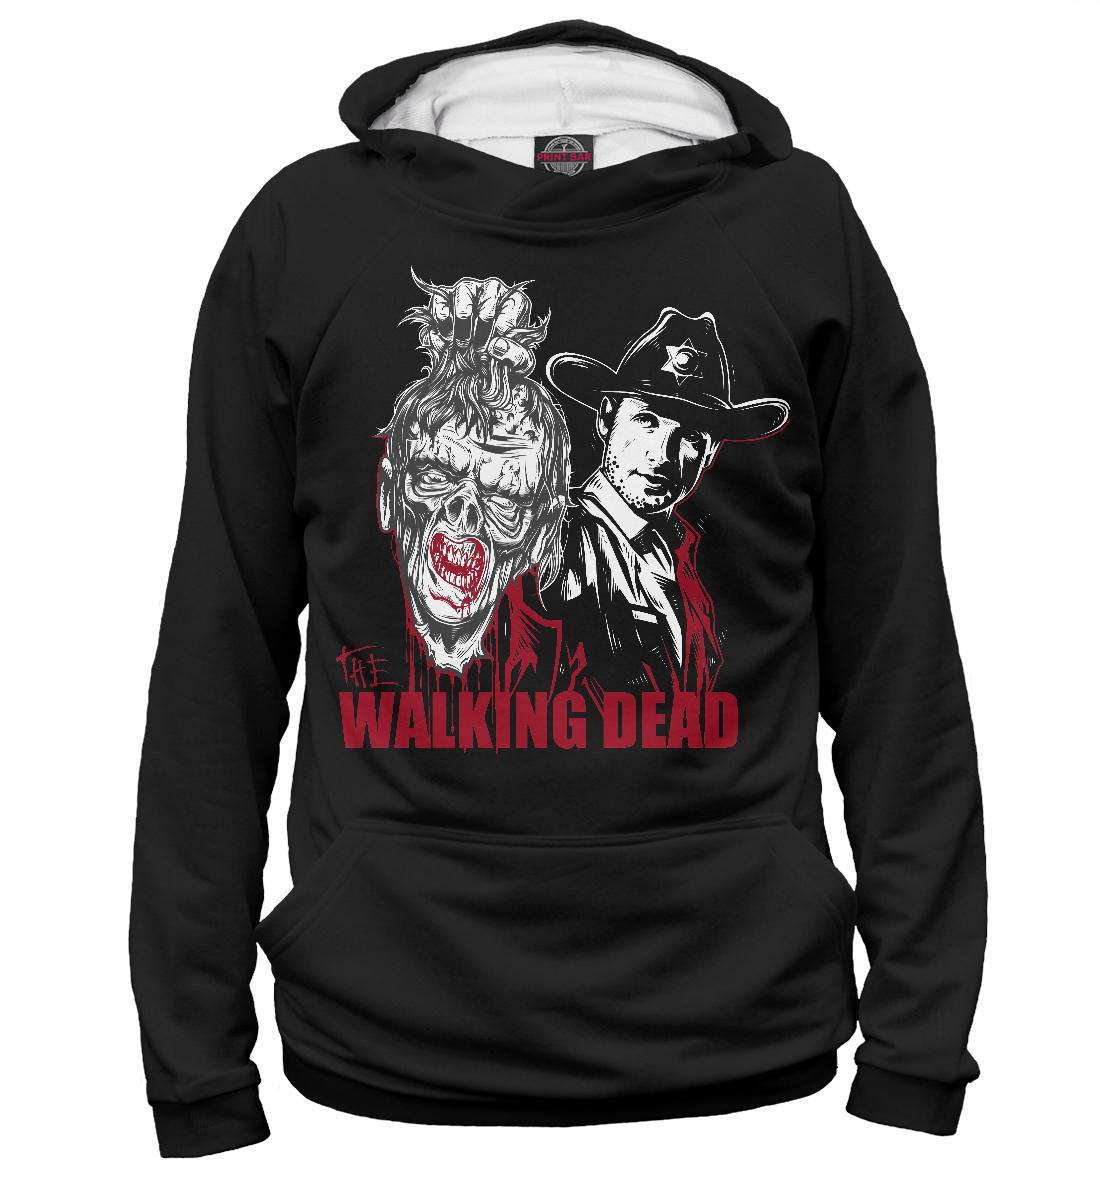 Купить The Walking Dead - Rick Grimes, Printbar, Худи, HOD-190166-hud-2